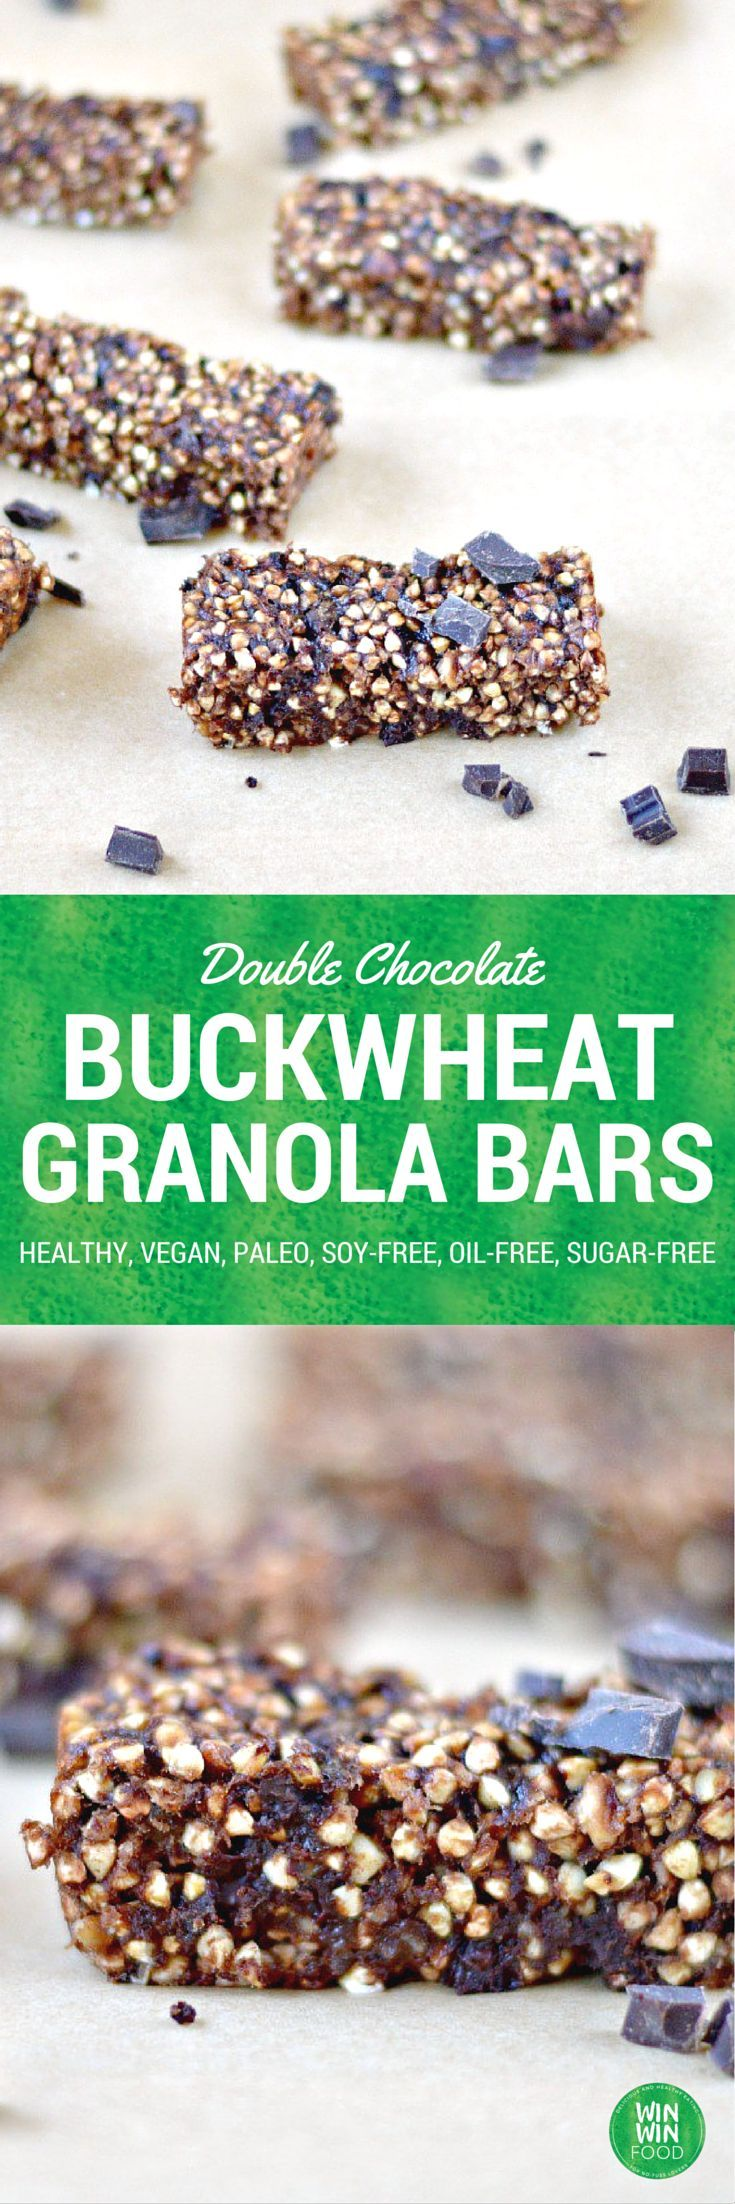 Double Chocolate Buckwheat Granola Bars | WIN-WINFOOD.com #healthy #vegan #paleo #glutenfree